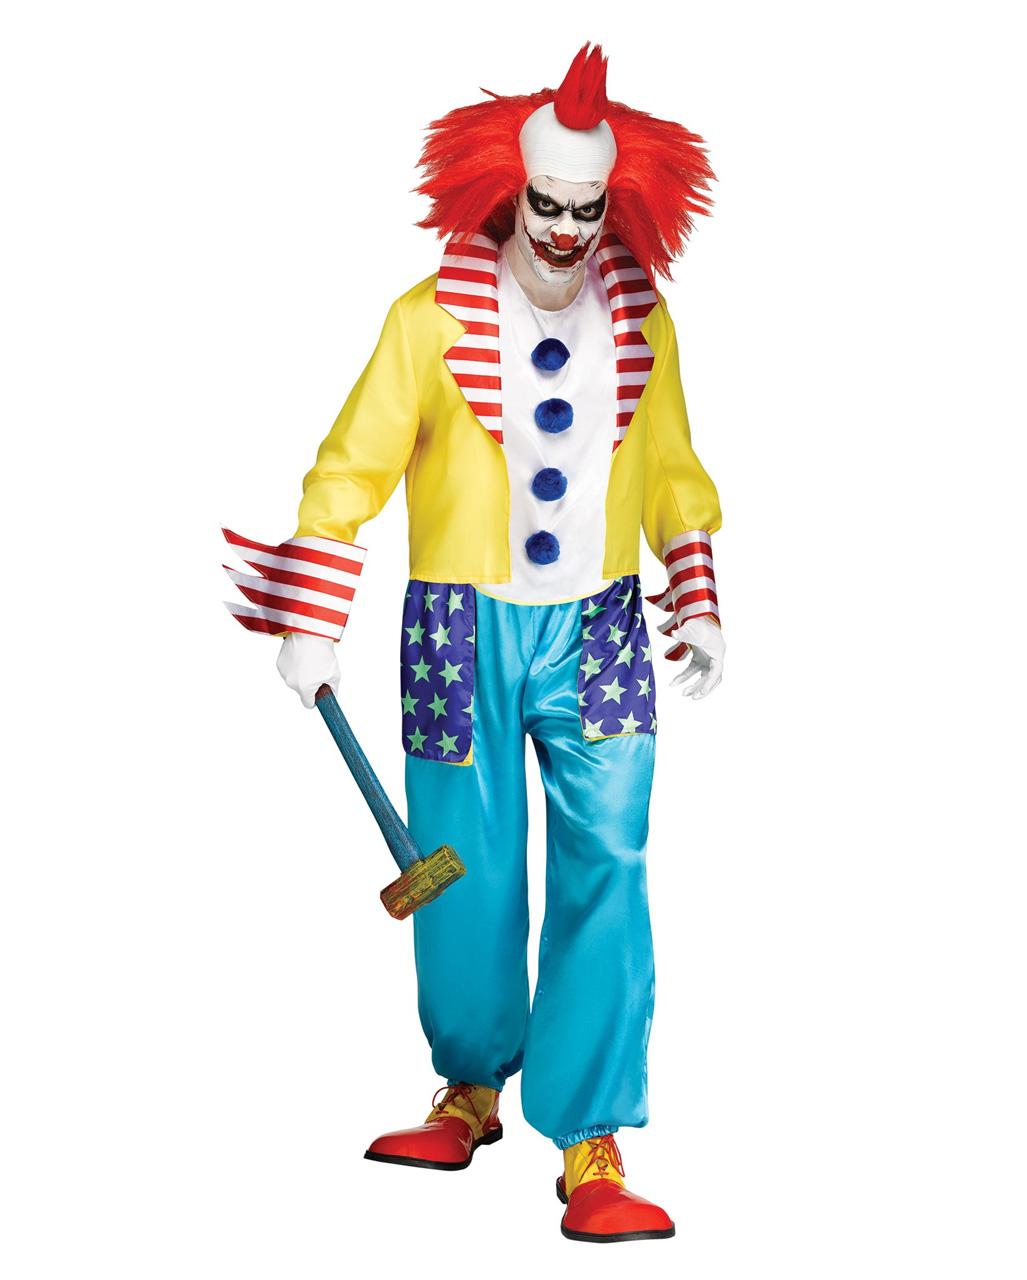 Boser Bunter Clown Halloween Kostum Fur Horror Partys Karneval